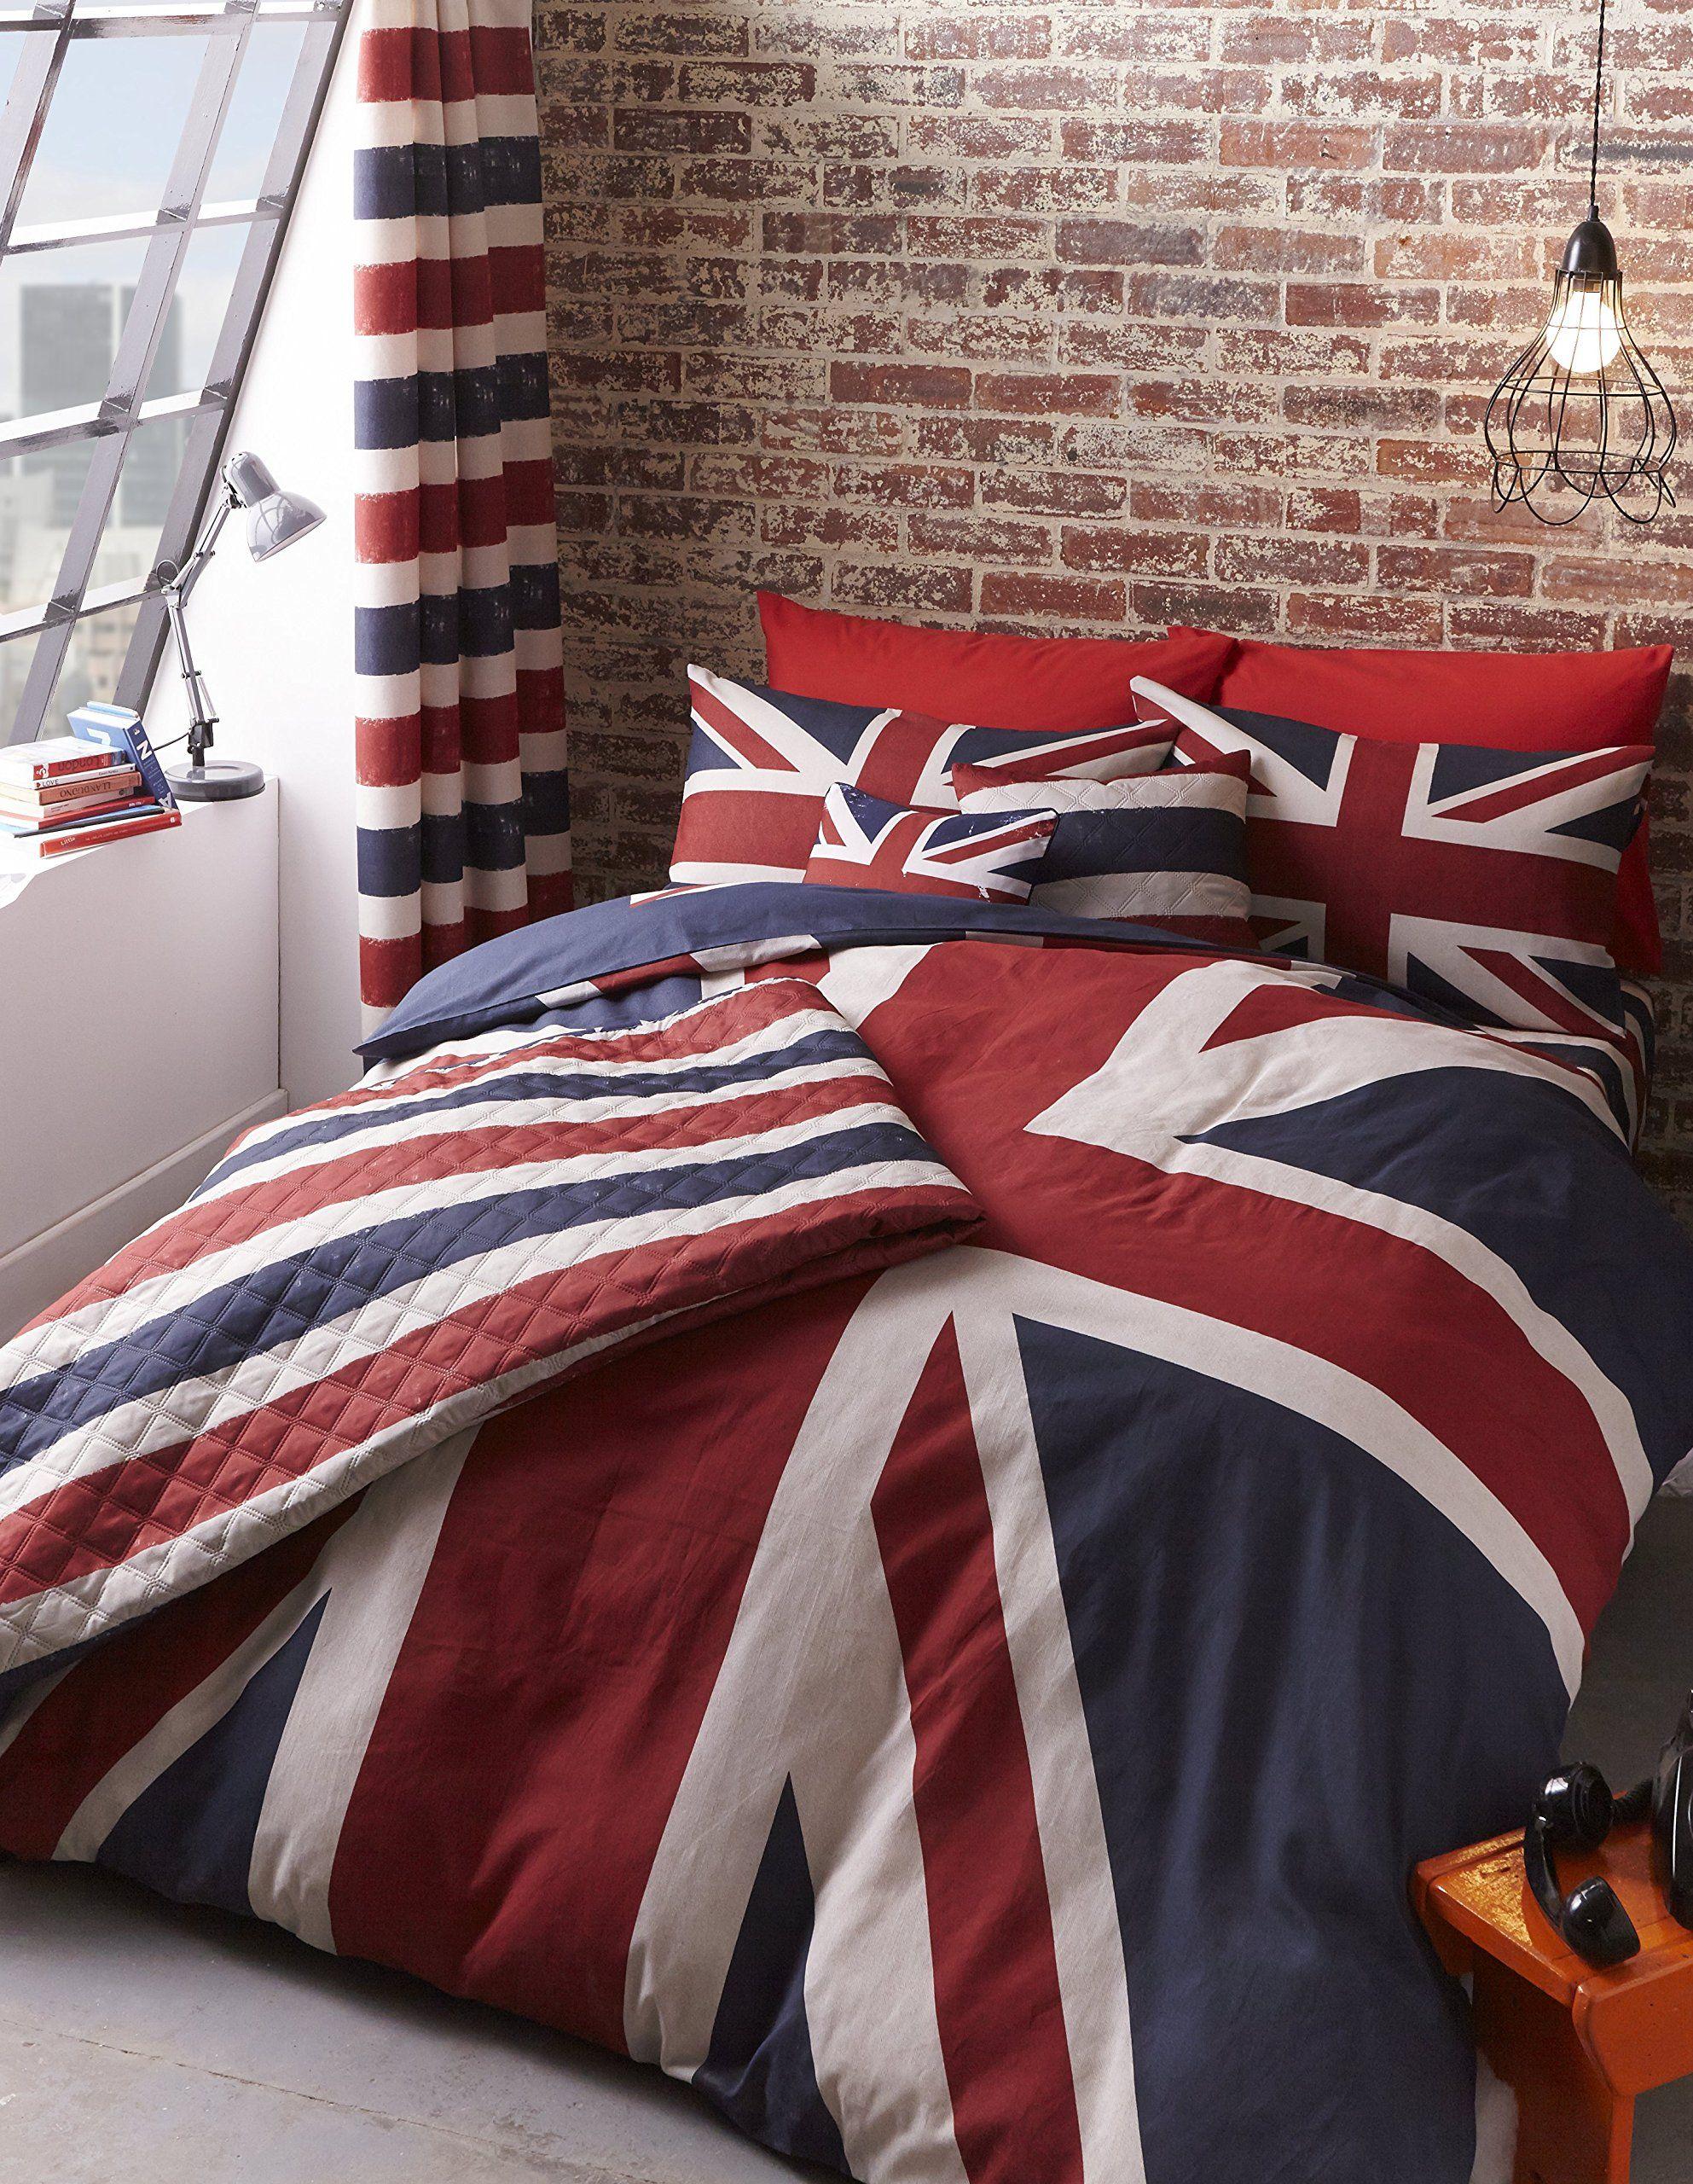 Parure De Lit London Londres Finest Lit 1 Personne Amazon Fr Cuisine Maison Schoner Wohnen Schlafzimmer Ideen Wohnen